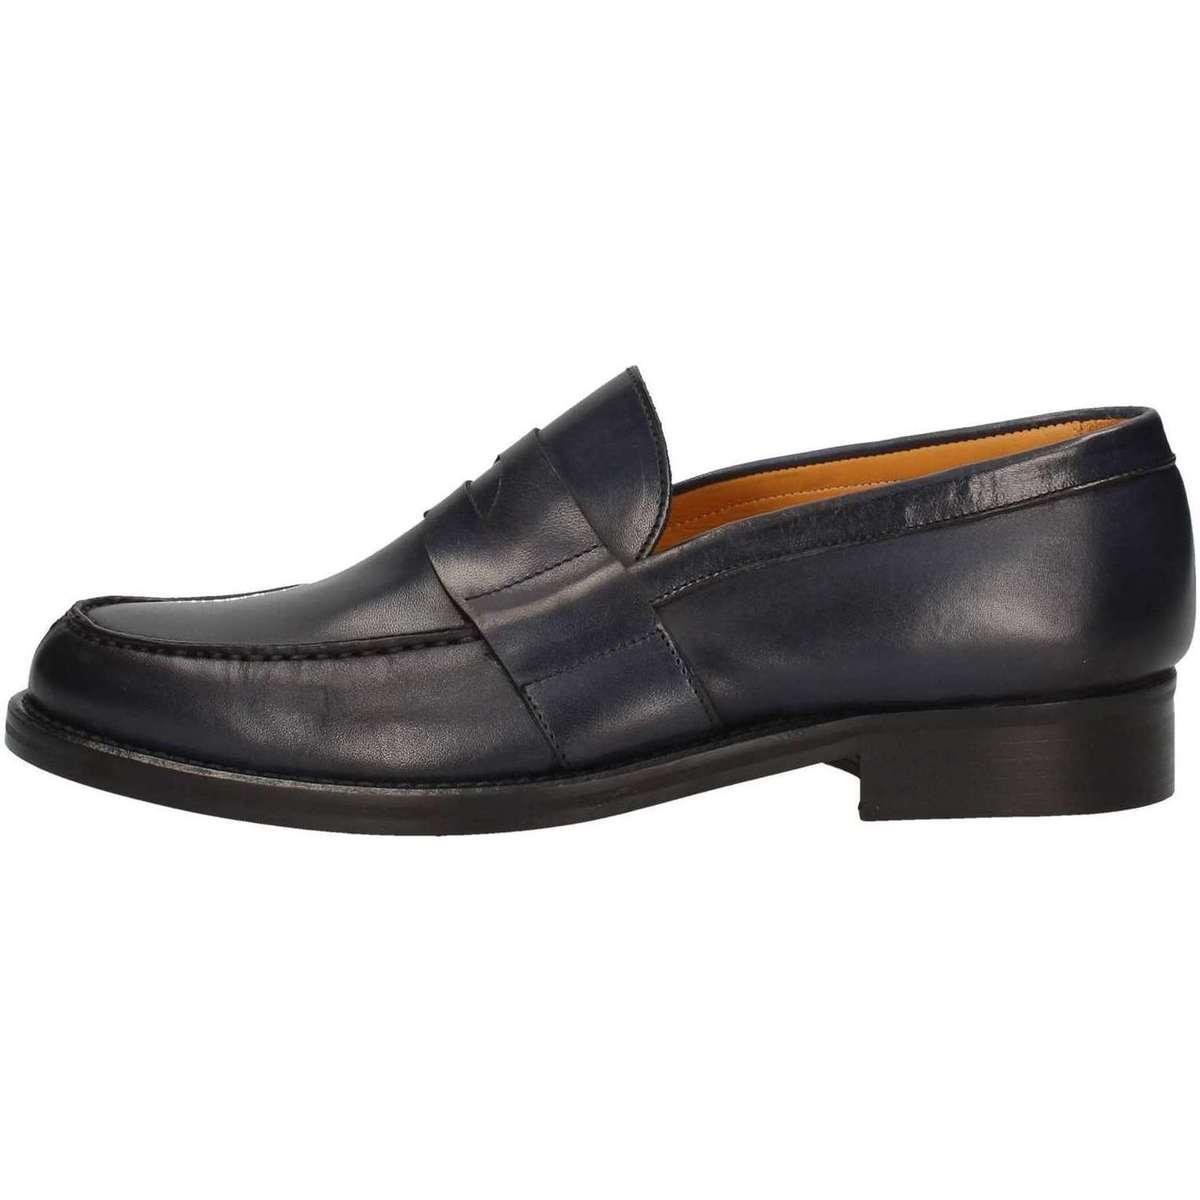 Hudson F08 Mokassin Mann Blau Blau - Schuhe Slipper Herren 112,10 €